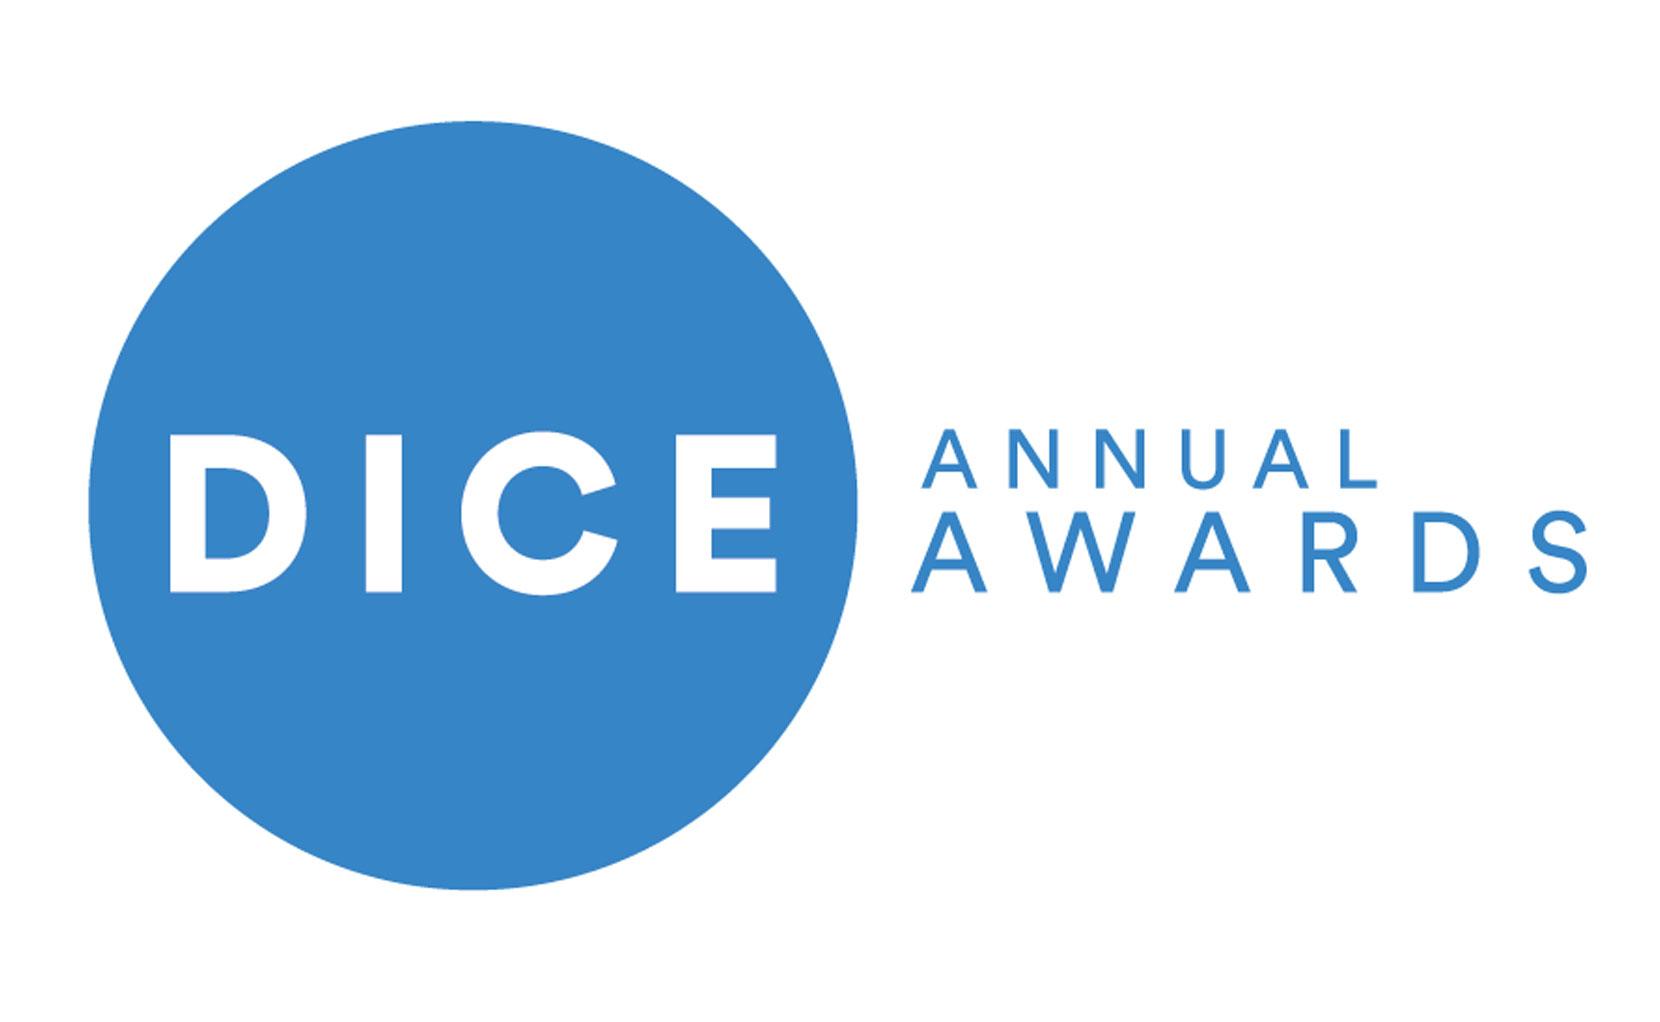 dice awards blue white.